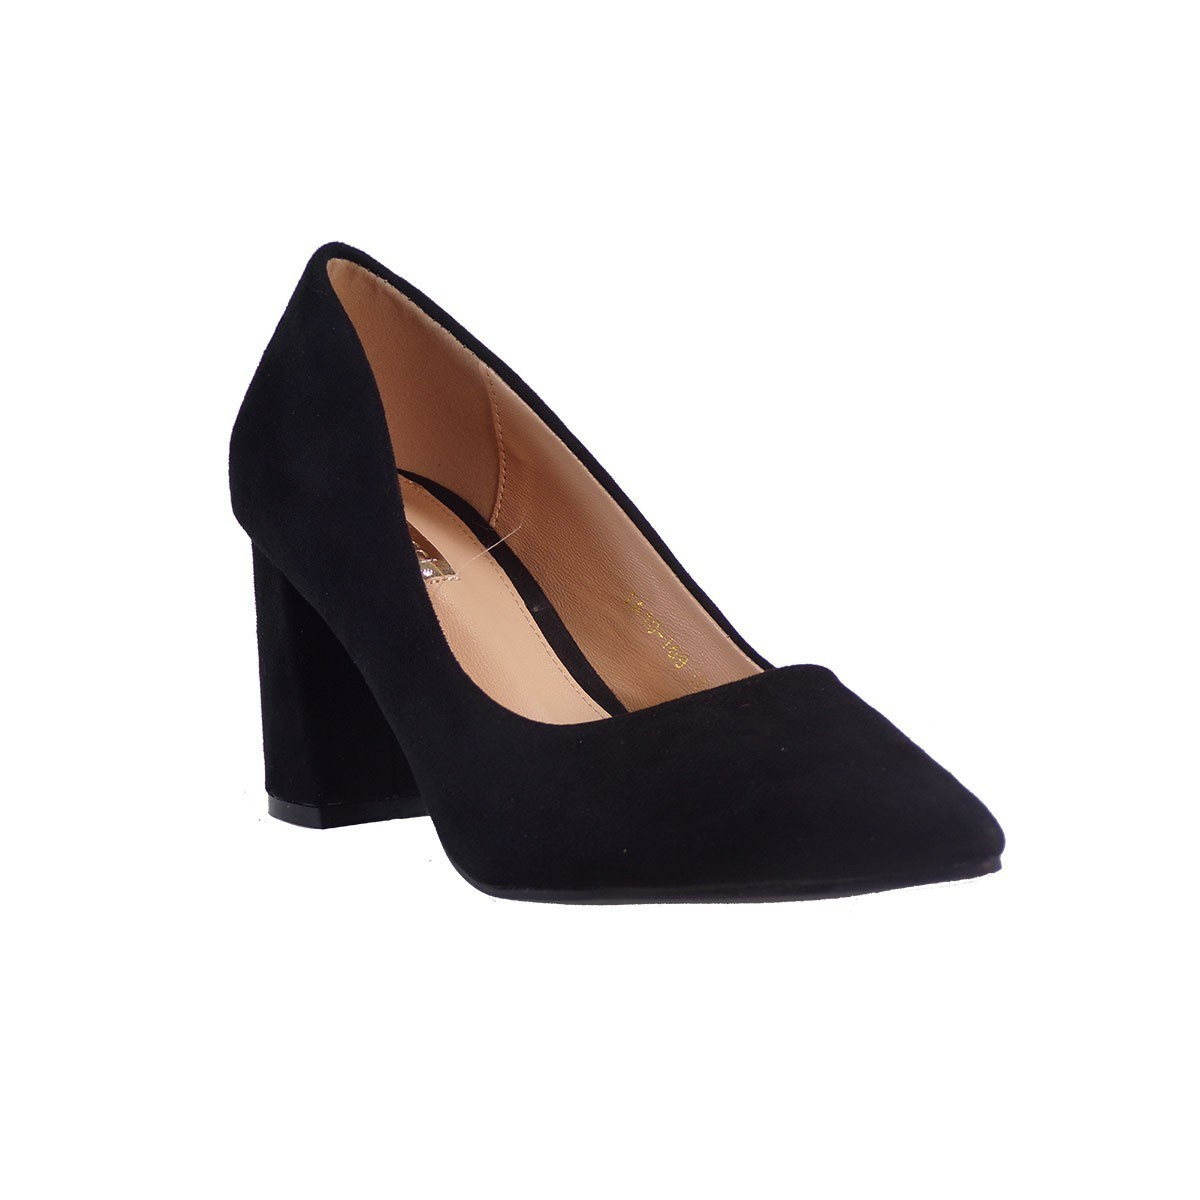 Bagiotashoes Γυναικεία Παπούτσια TA10-169 Mαύρο